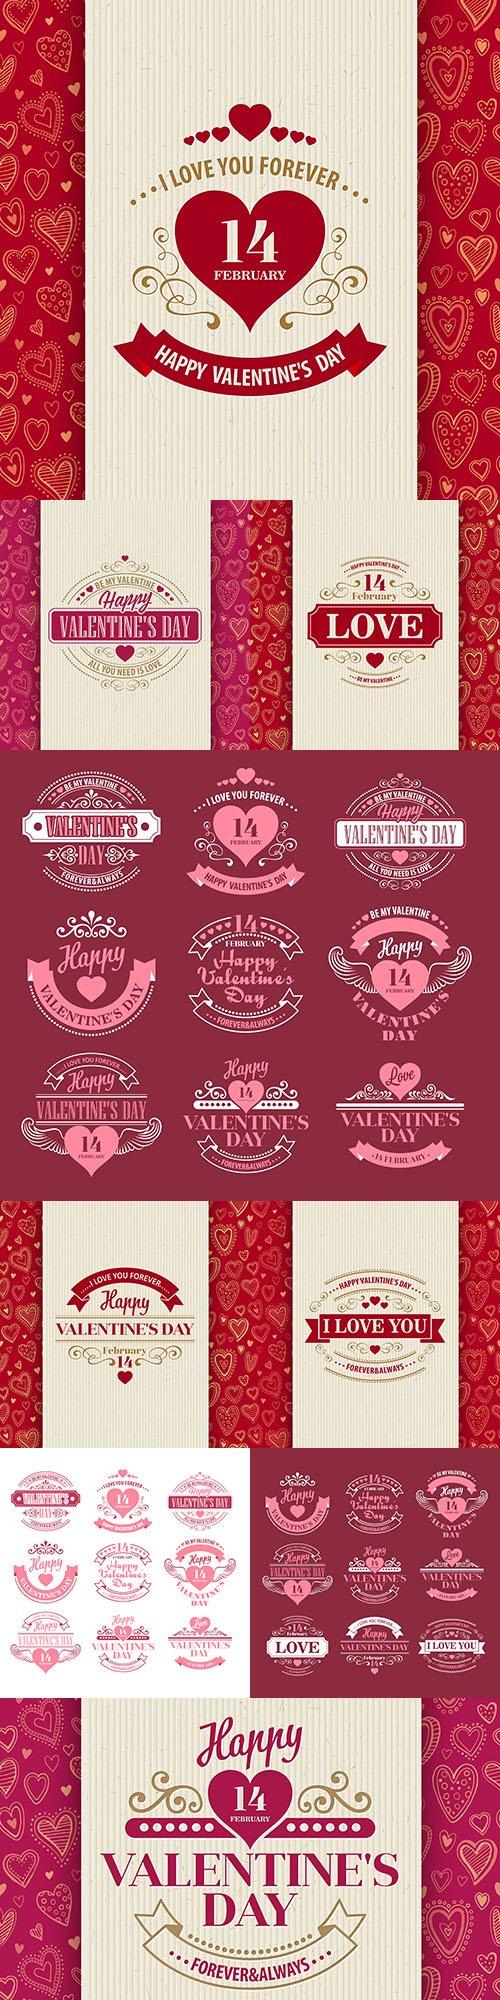 Happy Valentine's Day romantic decorative illustrations 31